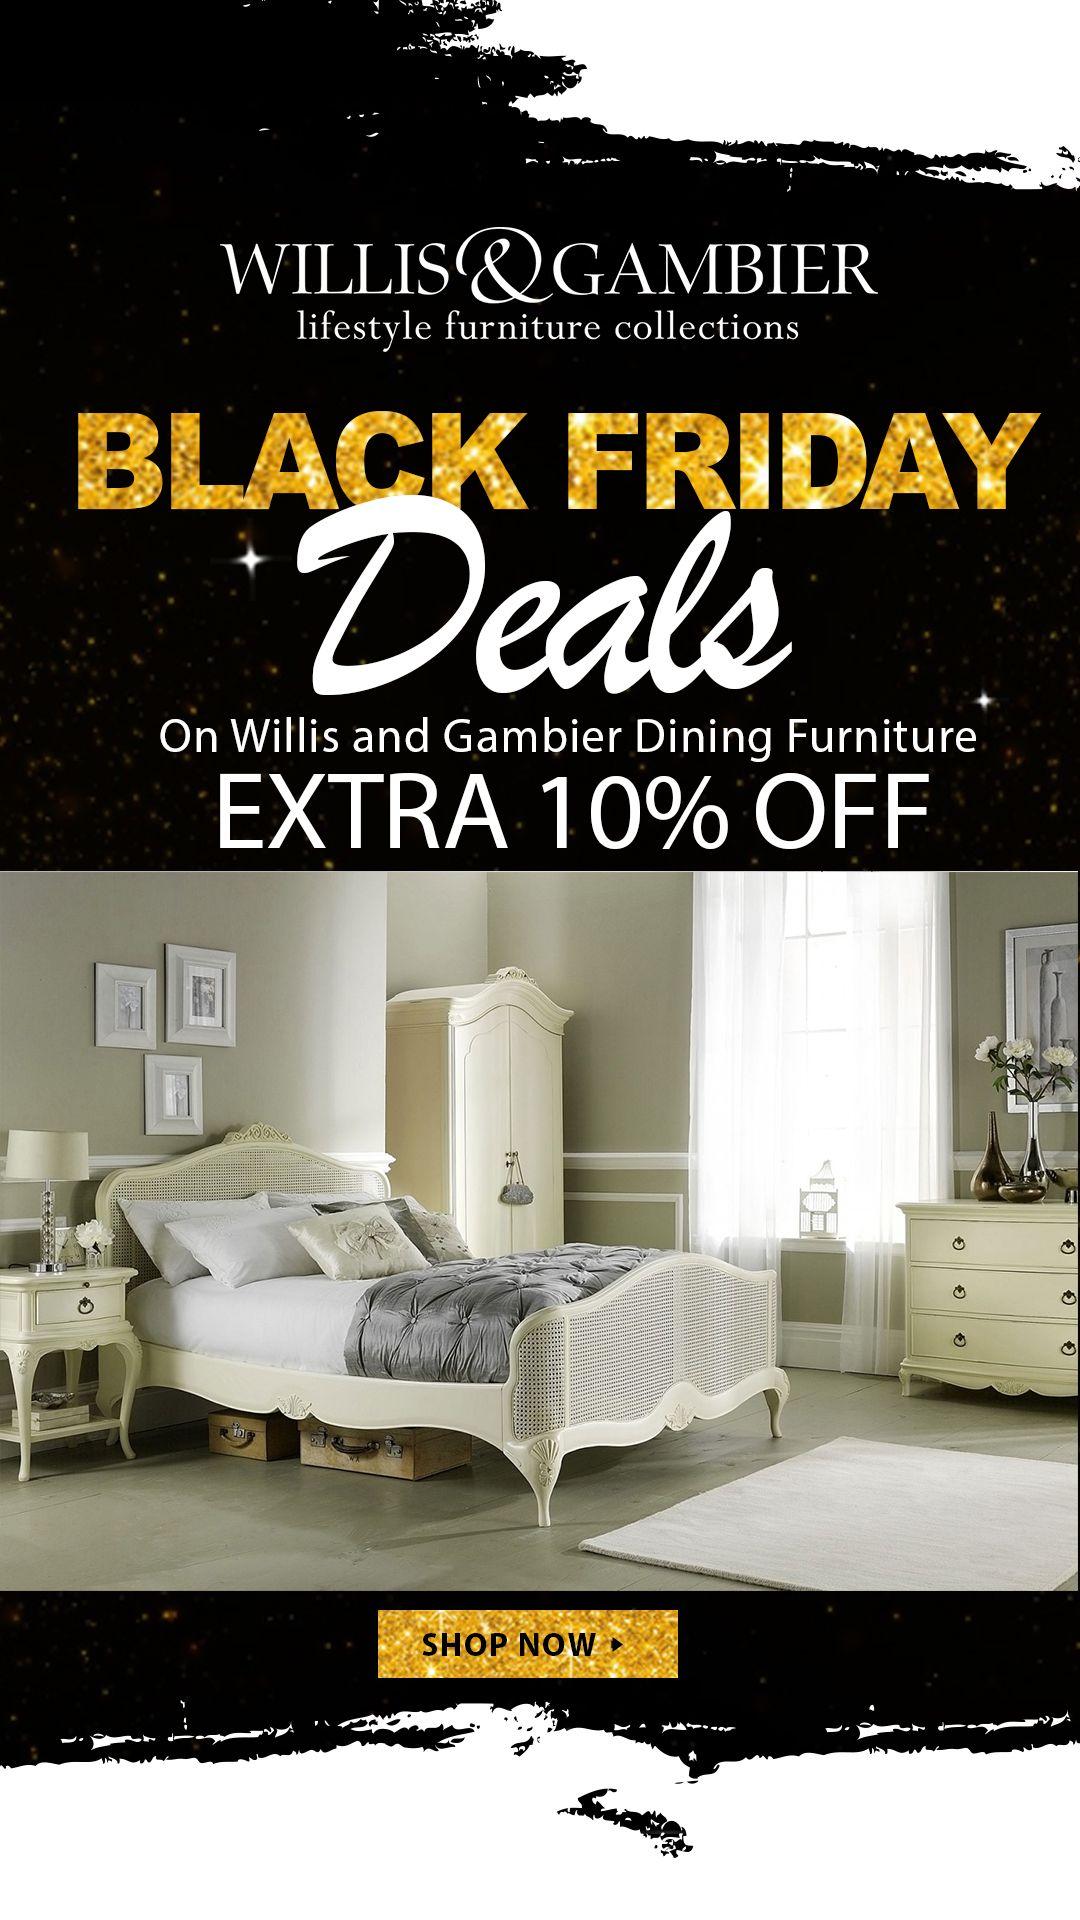 Badcock Home Furniture More 2015 Black Friday Ad Black Friday